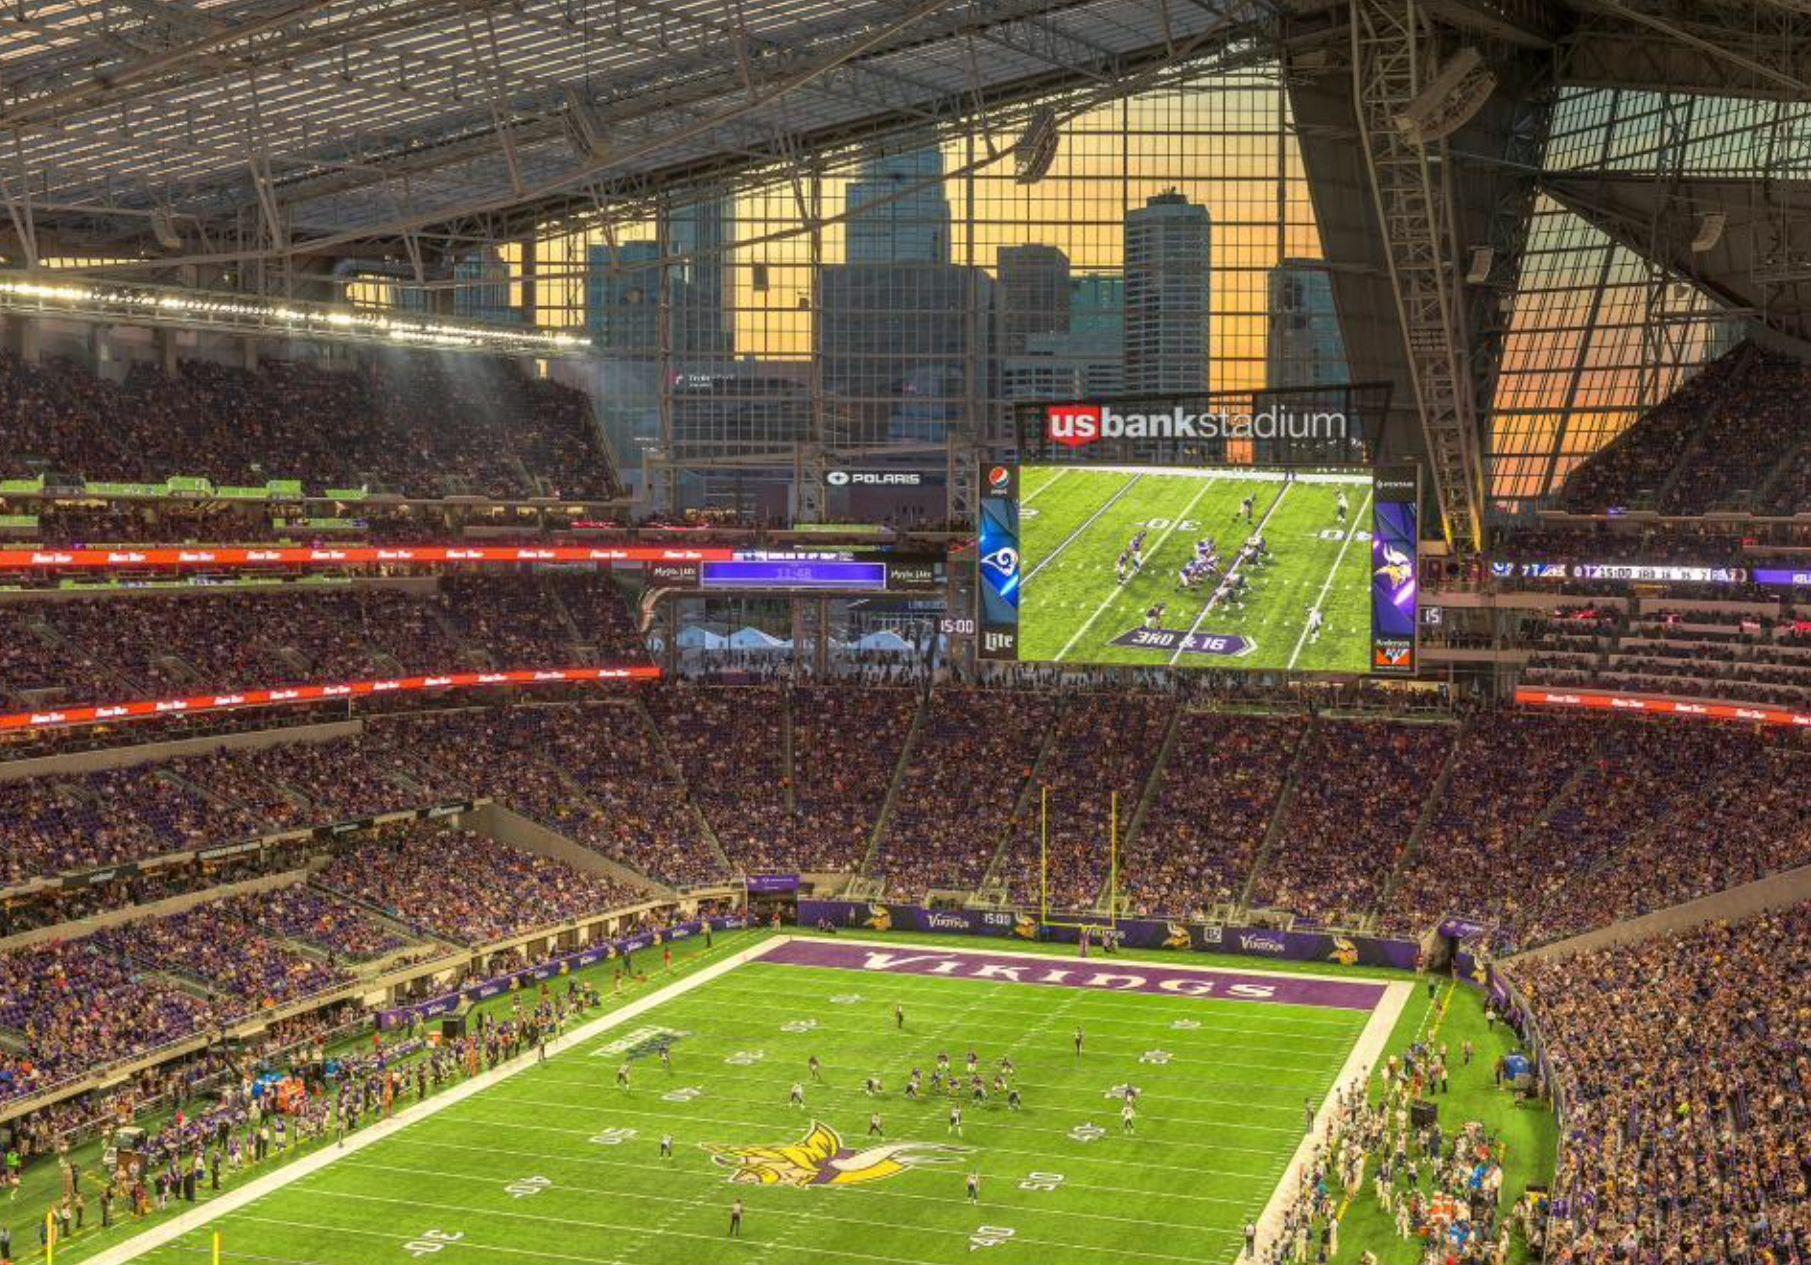 Us Bank Stadium Soccer Field Minneapolis Minnesota